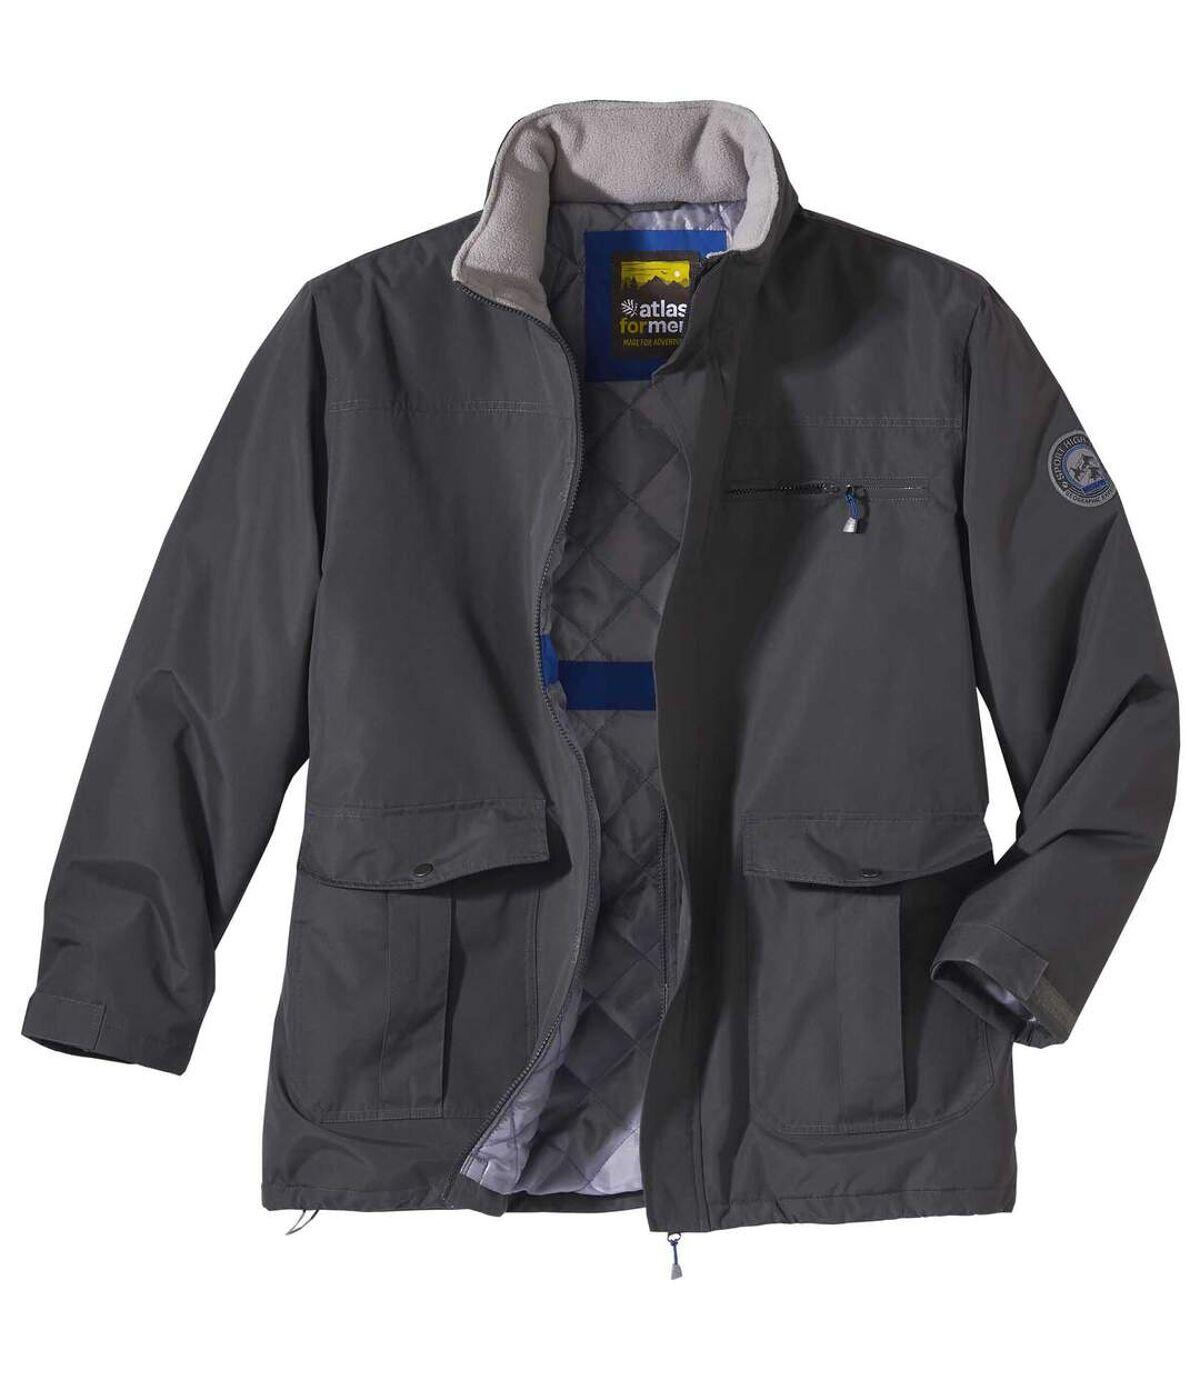 Men's Gray All-Terrain Parka - Foldaway Hood -Water-Repellent - Full Zip Atlas For Men